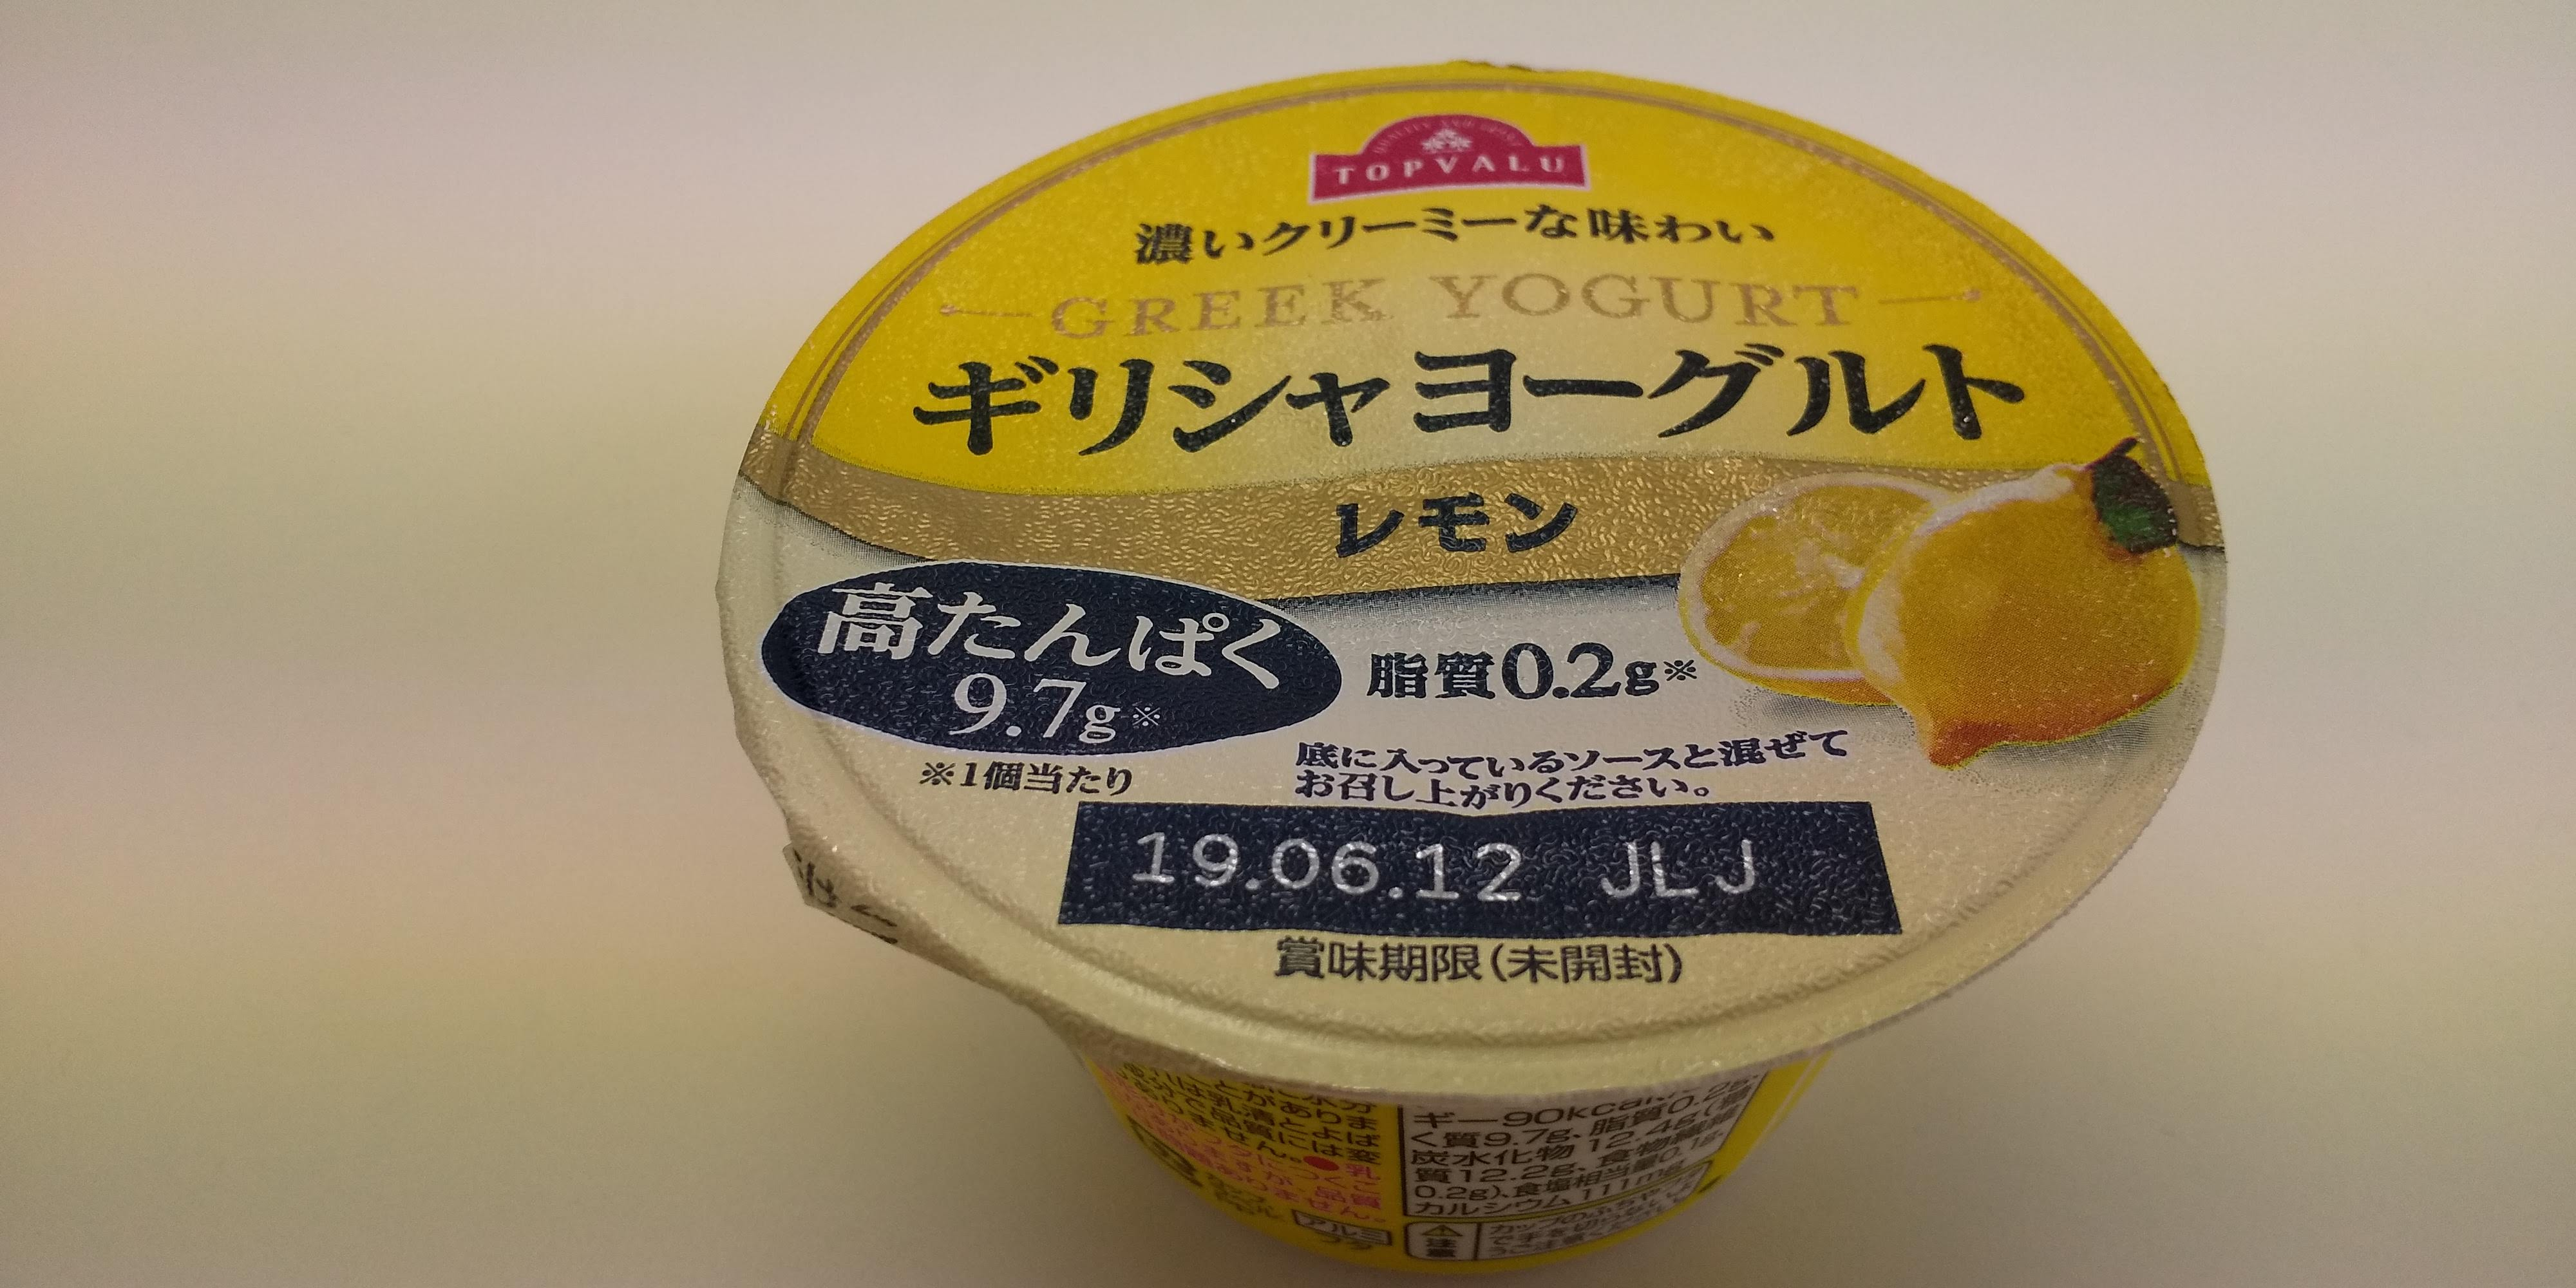 TOPVALUのギリシャーヨーグルト レモン